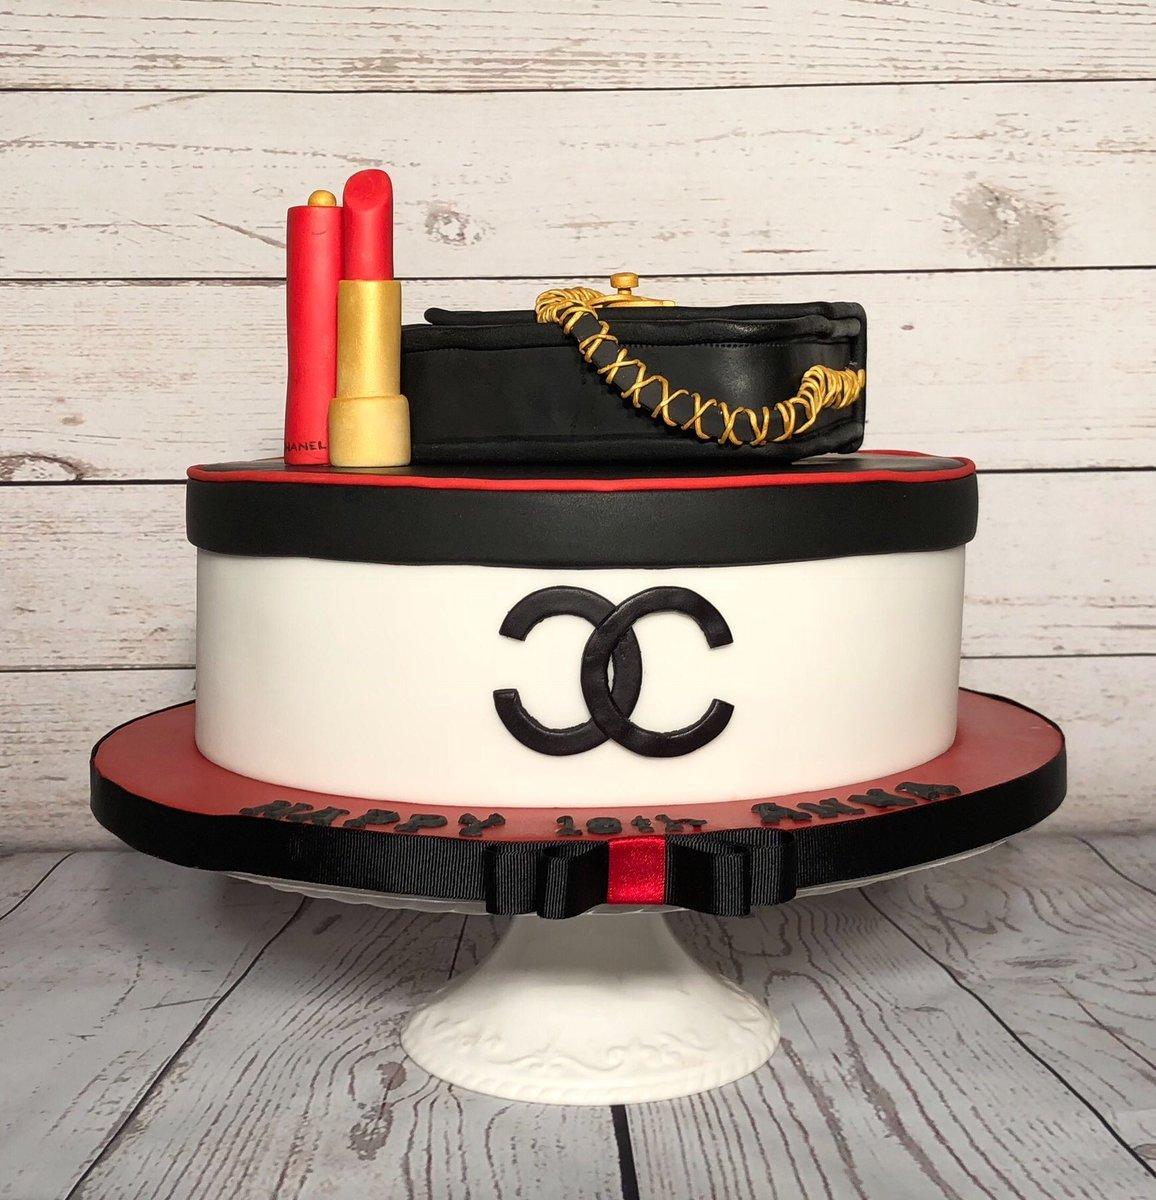 Tremendous Cake Mad On Twitter 18Th Birthday Celebrations Yesterday Rich Funny Birthday Cards Online Alyptdamsfinfo